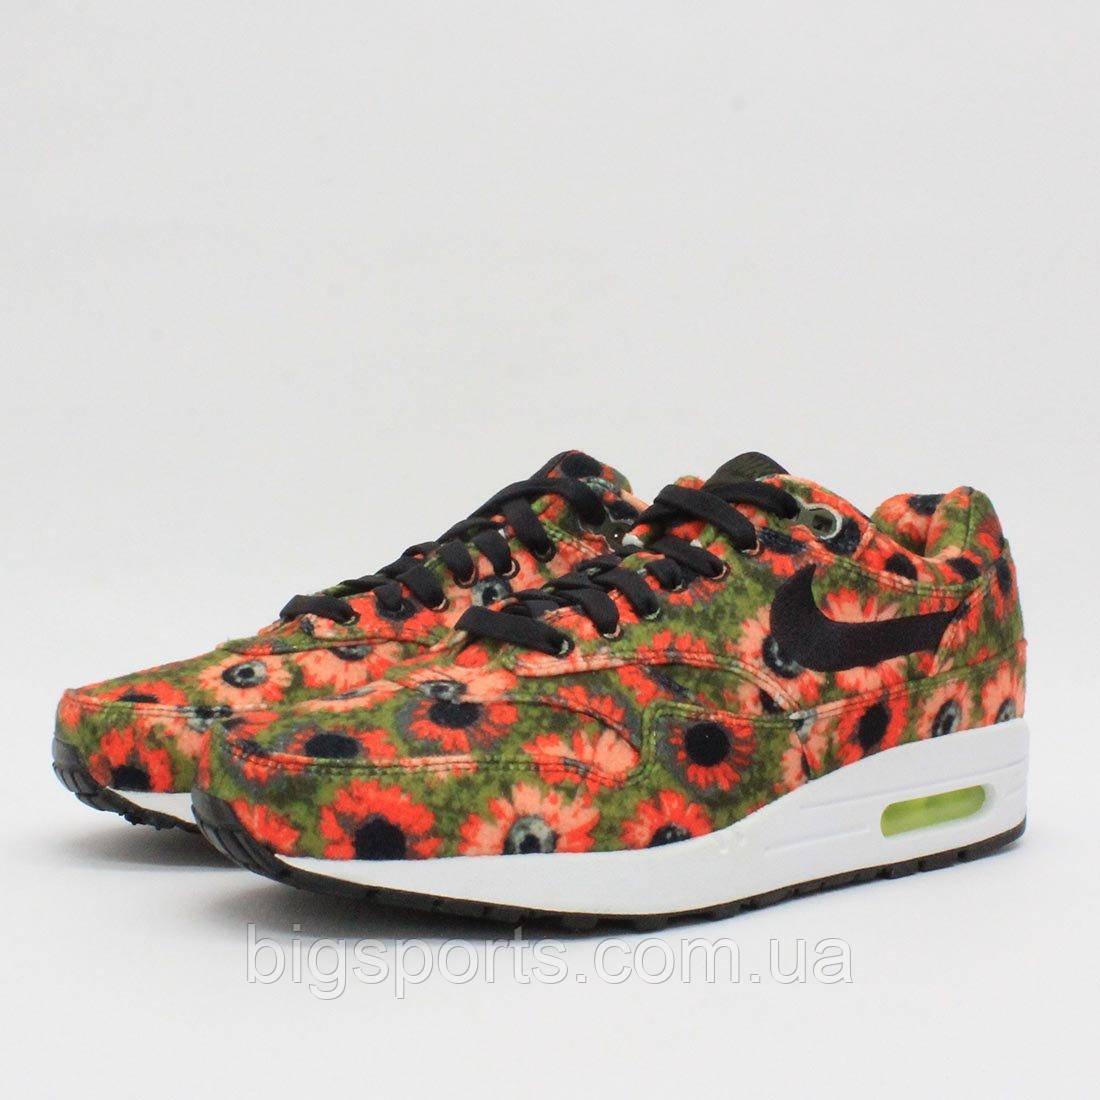 Кроссовки муж. Nike Air Max 1 Premium SE (арт. 858876-003)